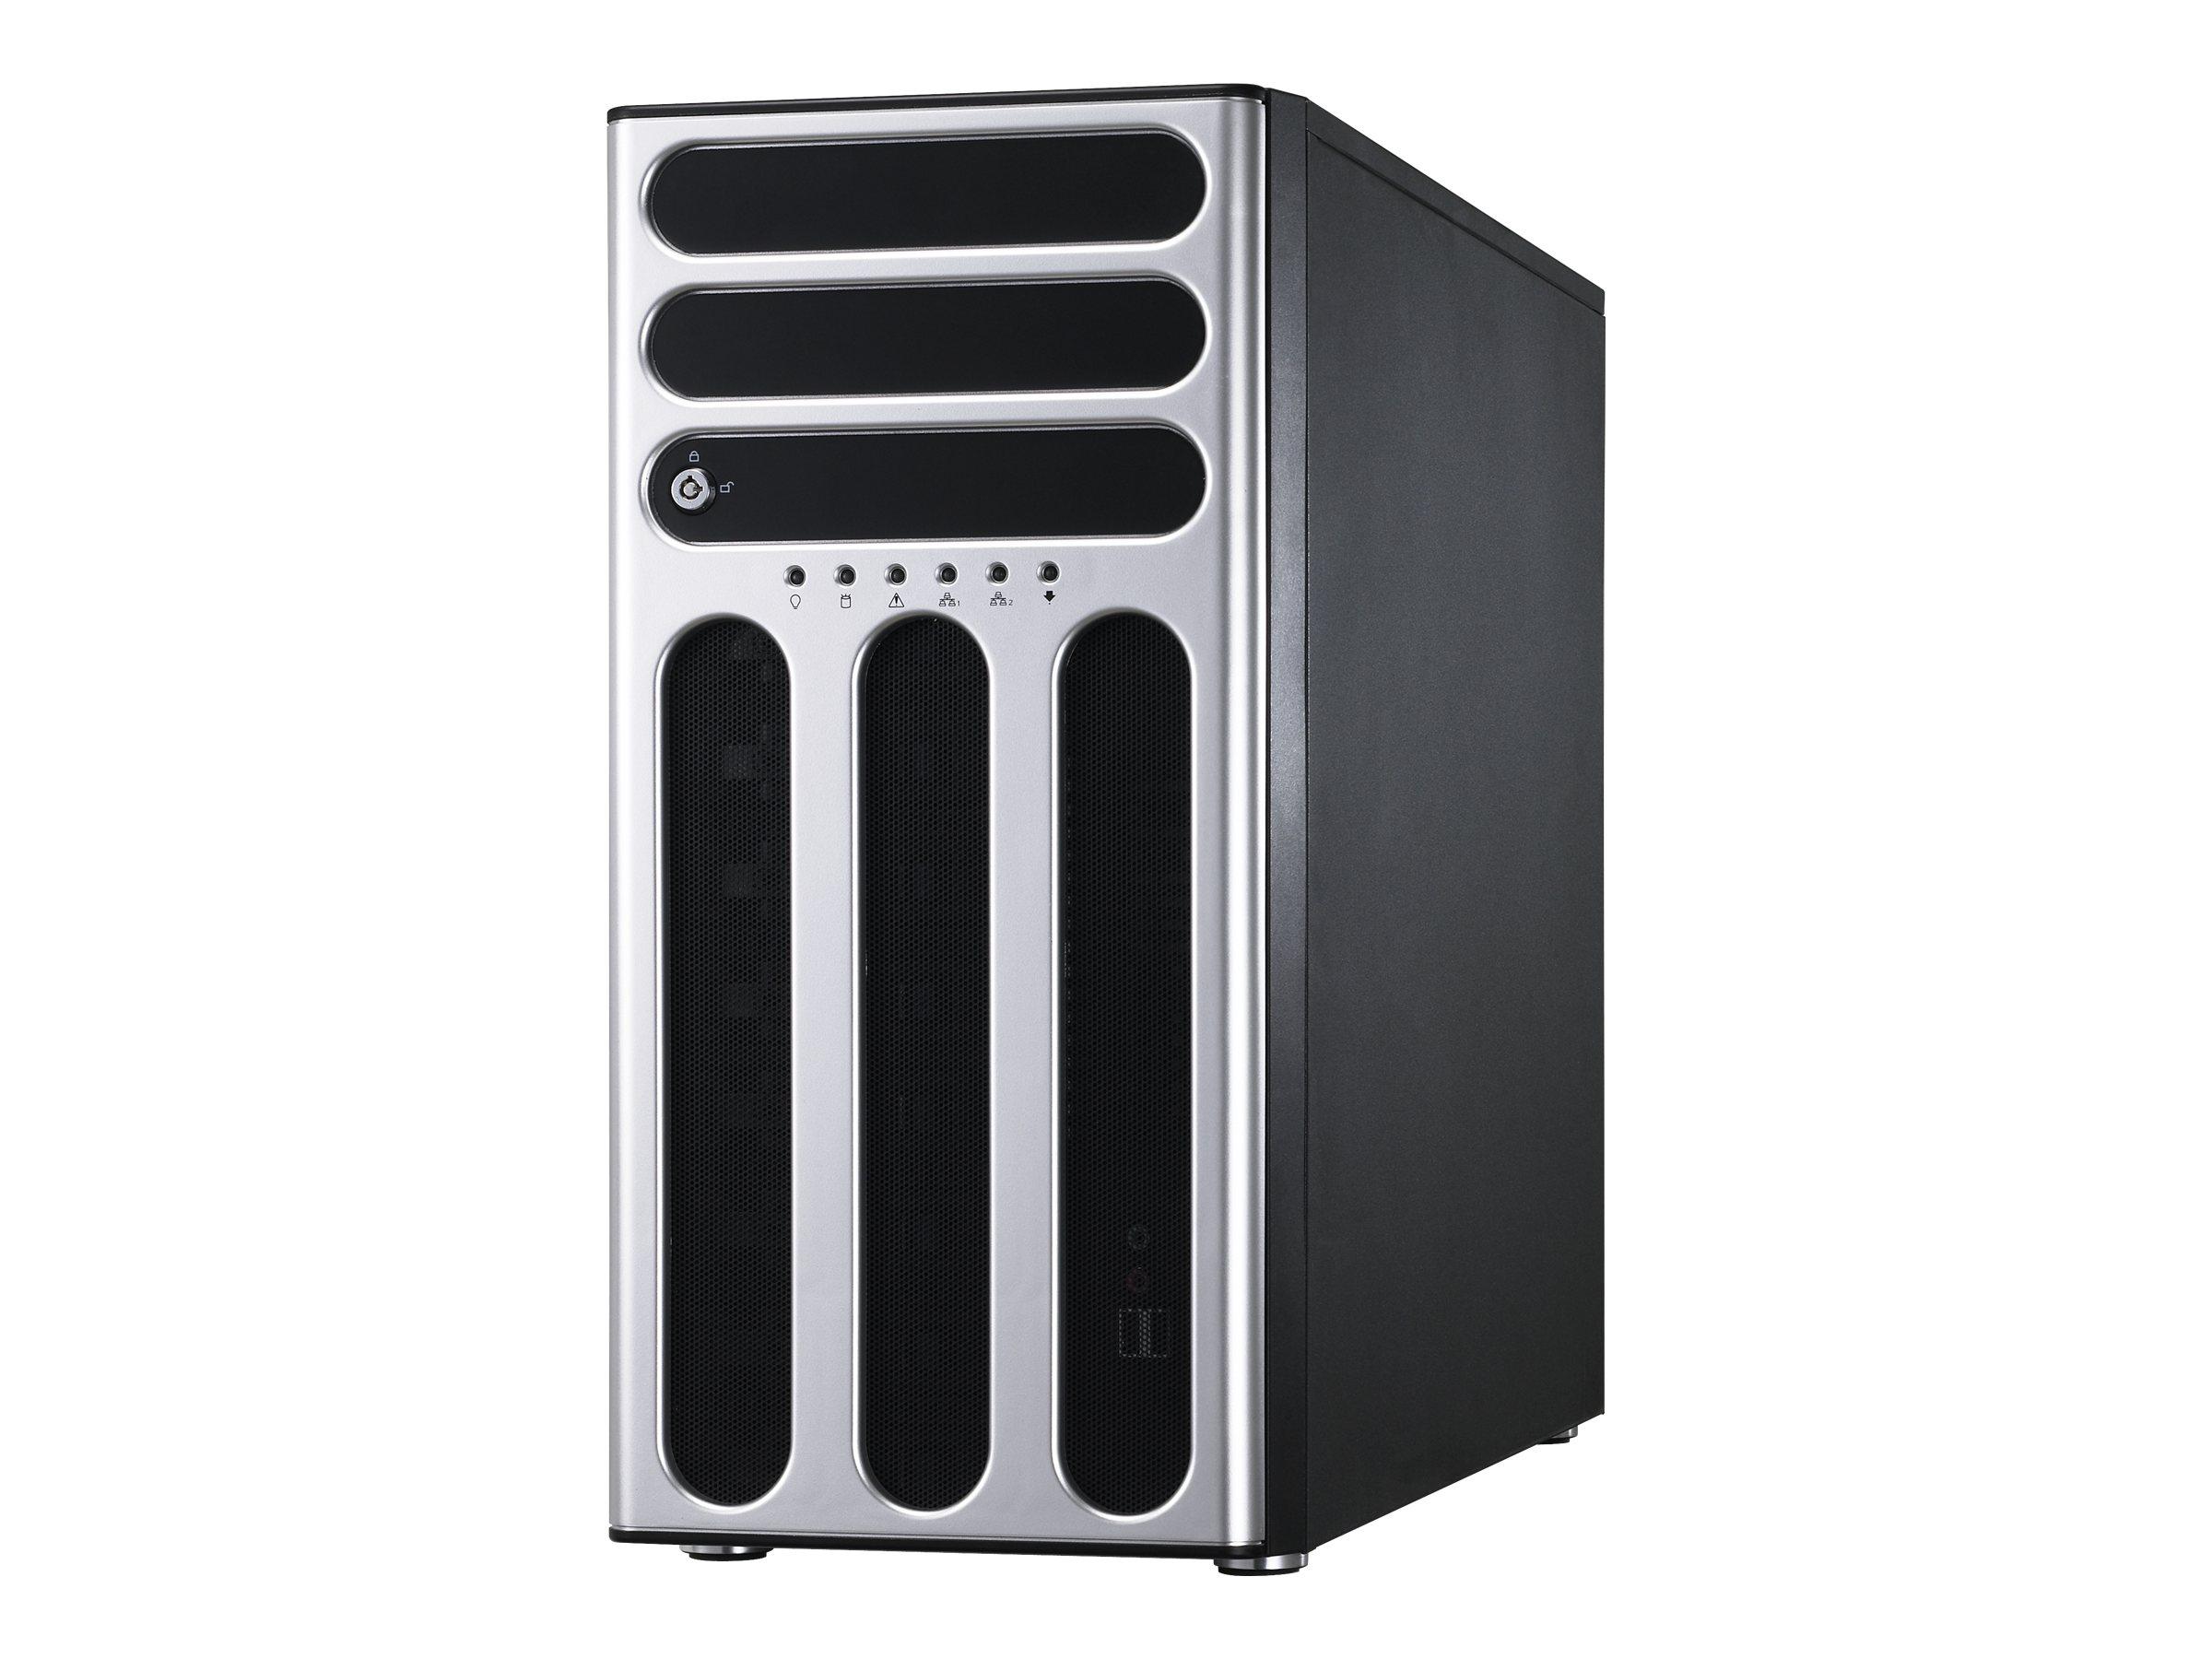 ASUS TS700-E7/RS8 - Server - Tower - 5U - zweiweg - RAM 0 MB